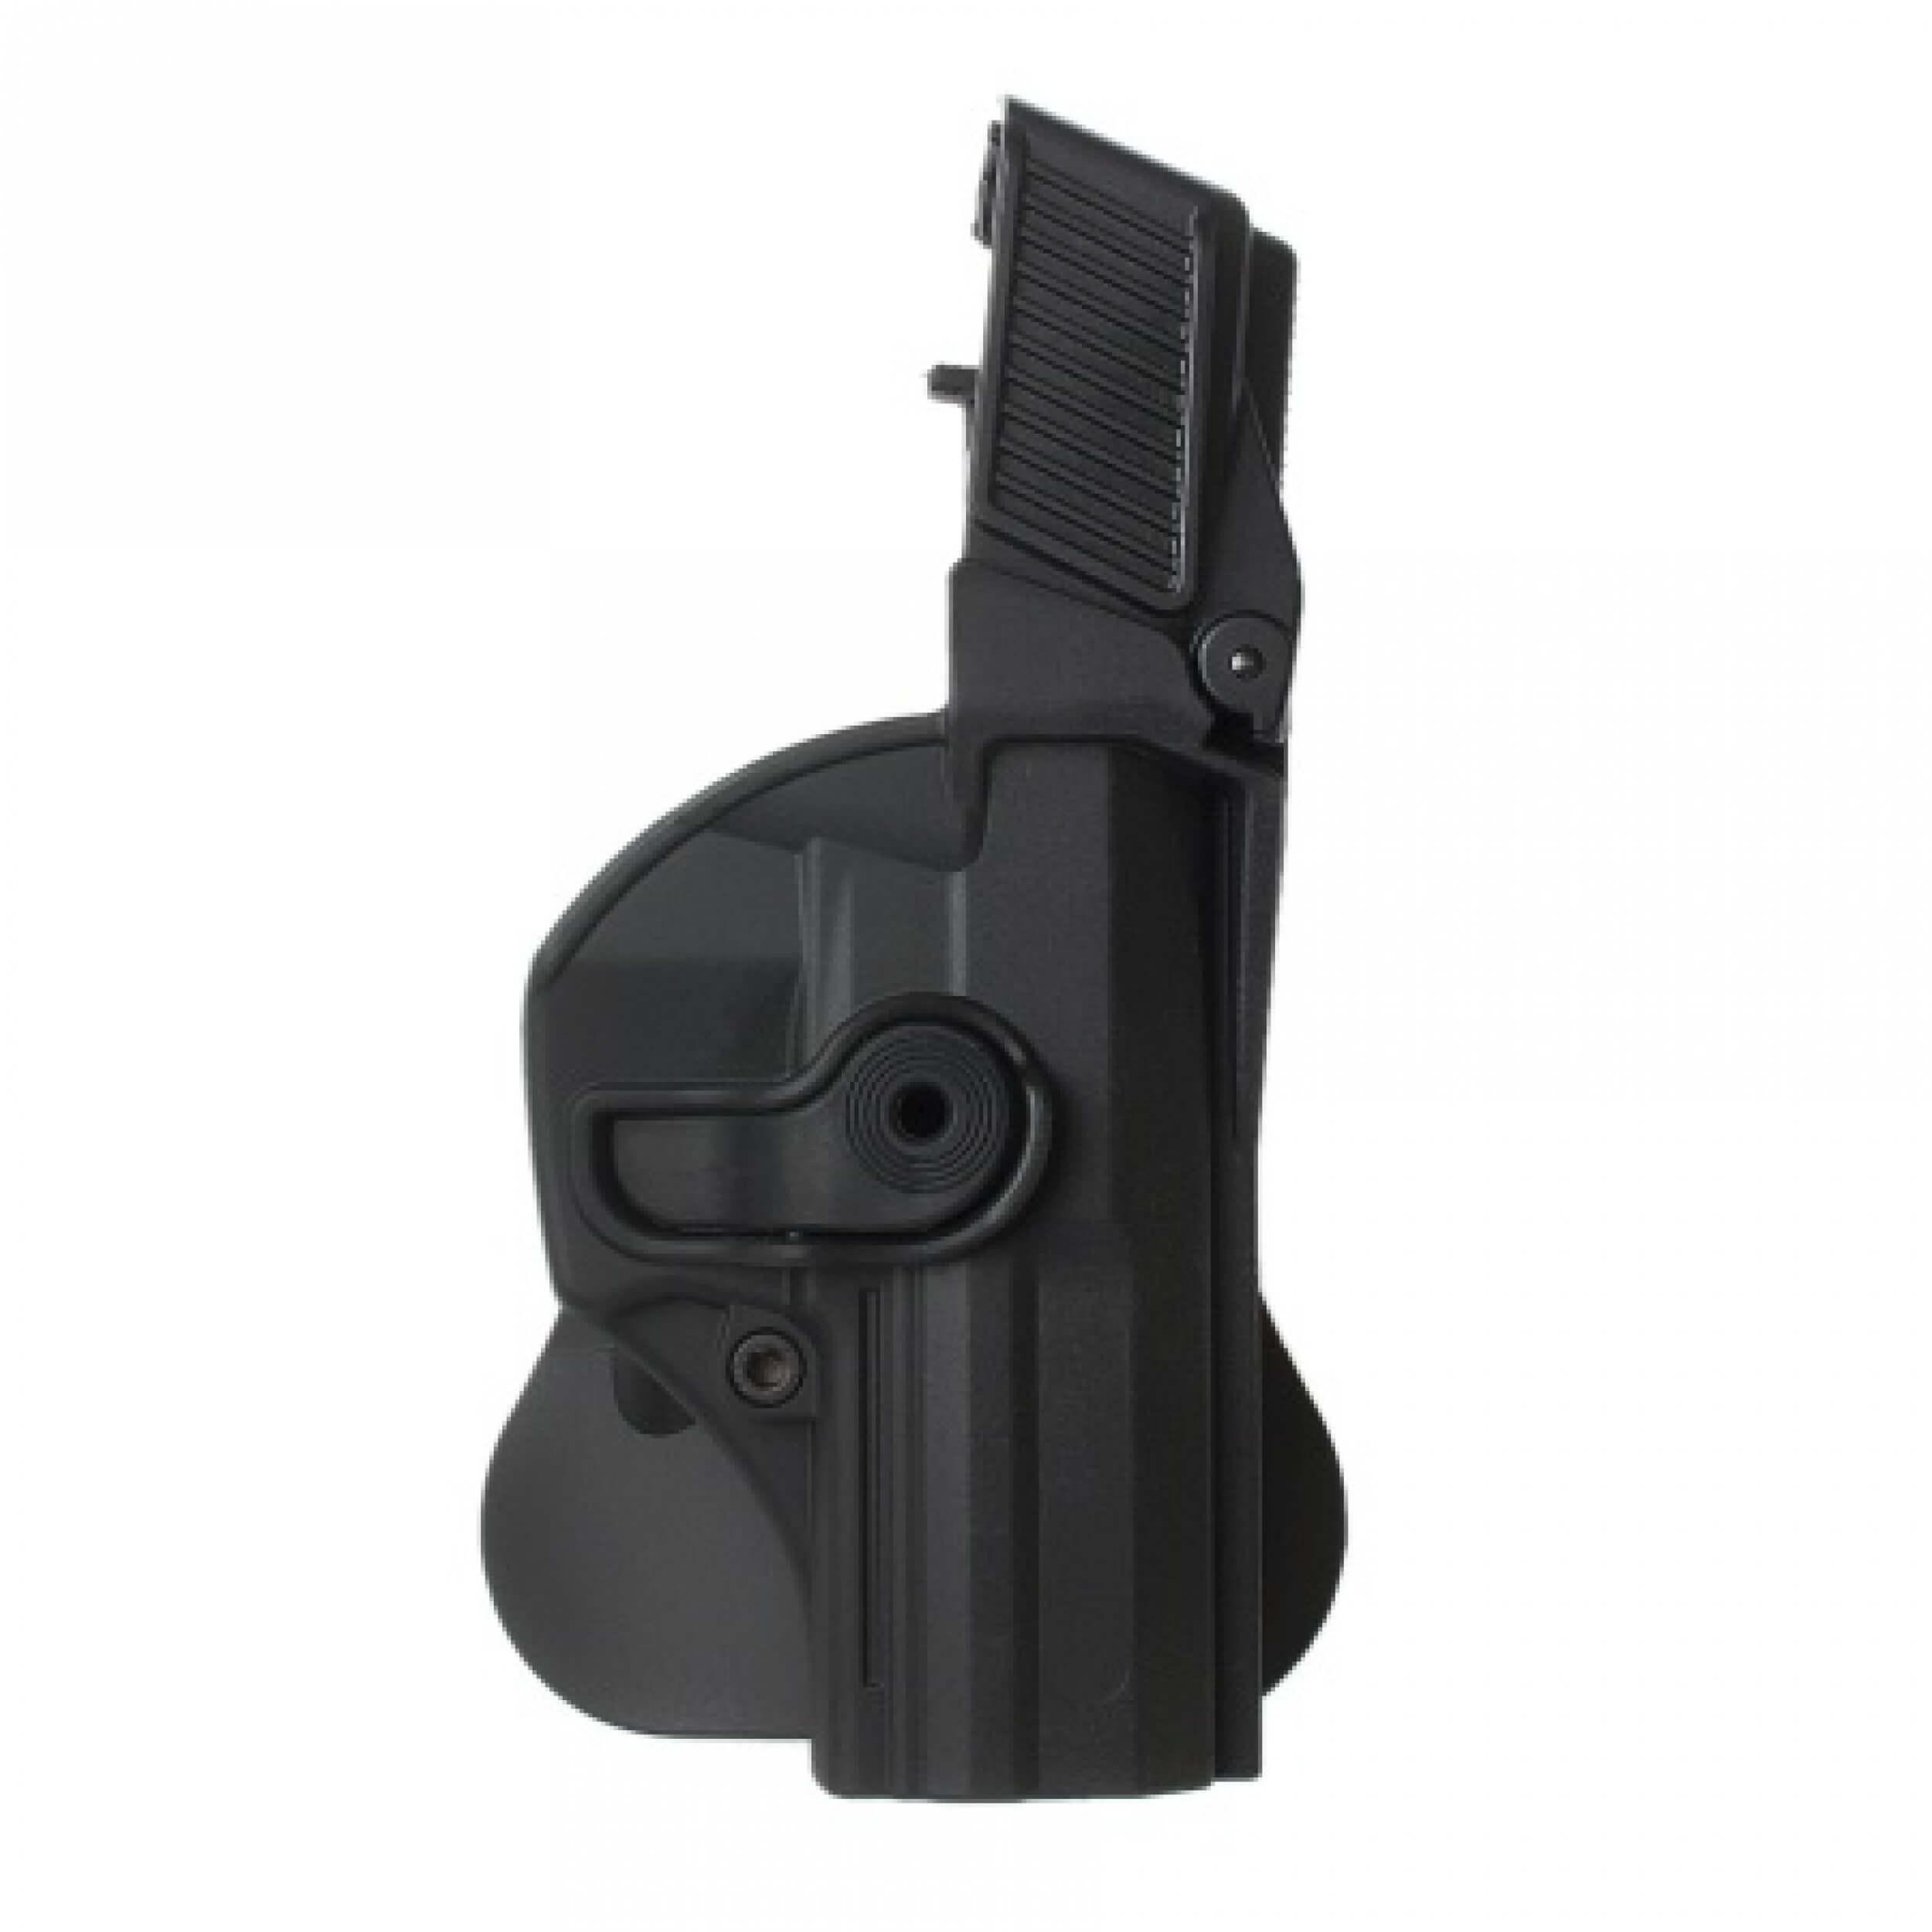 Polymer Retention Roto Holster Level3 Glock 17/22/28/31 Gen 4 & 5